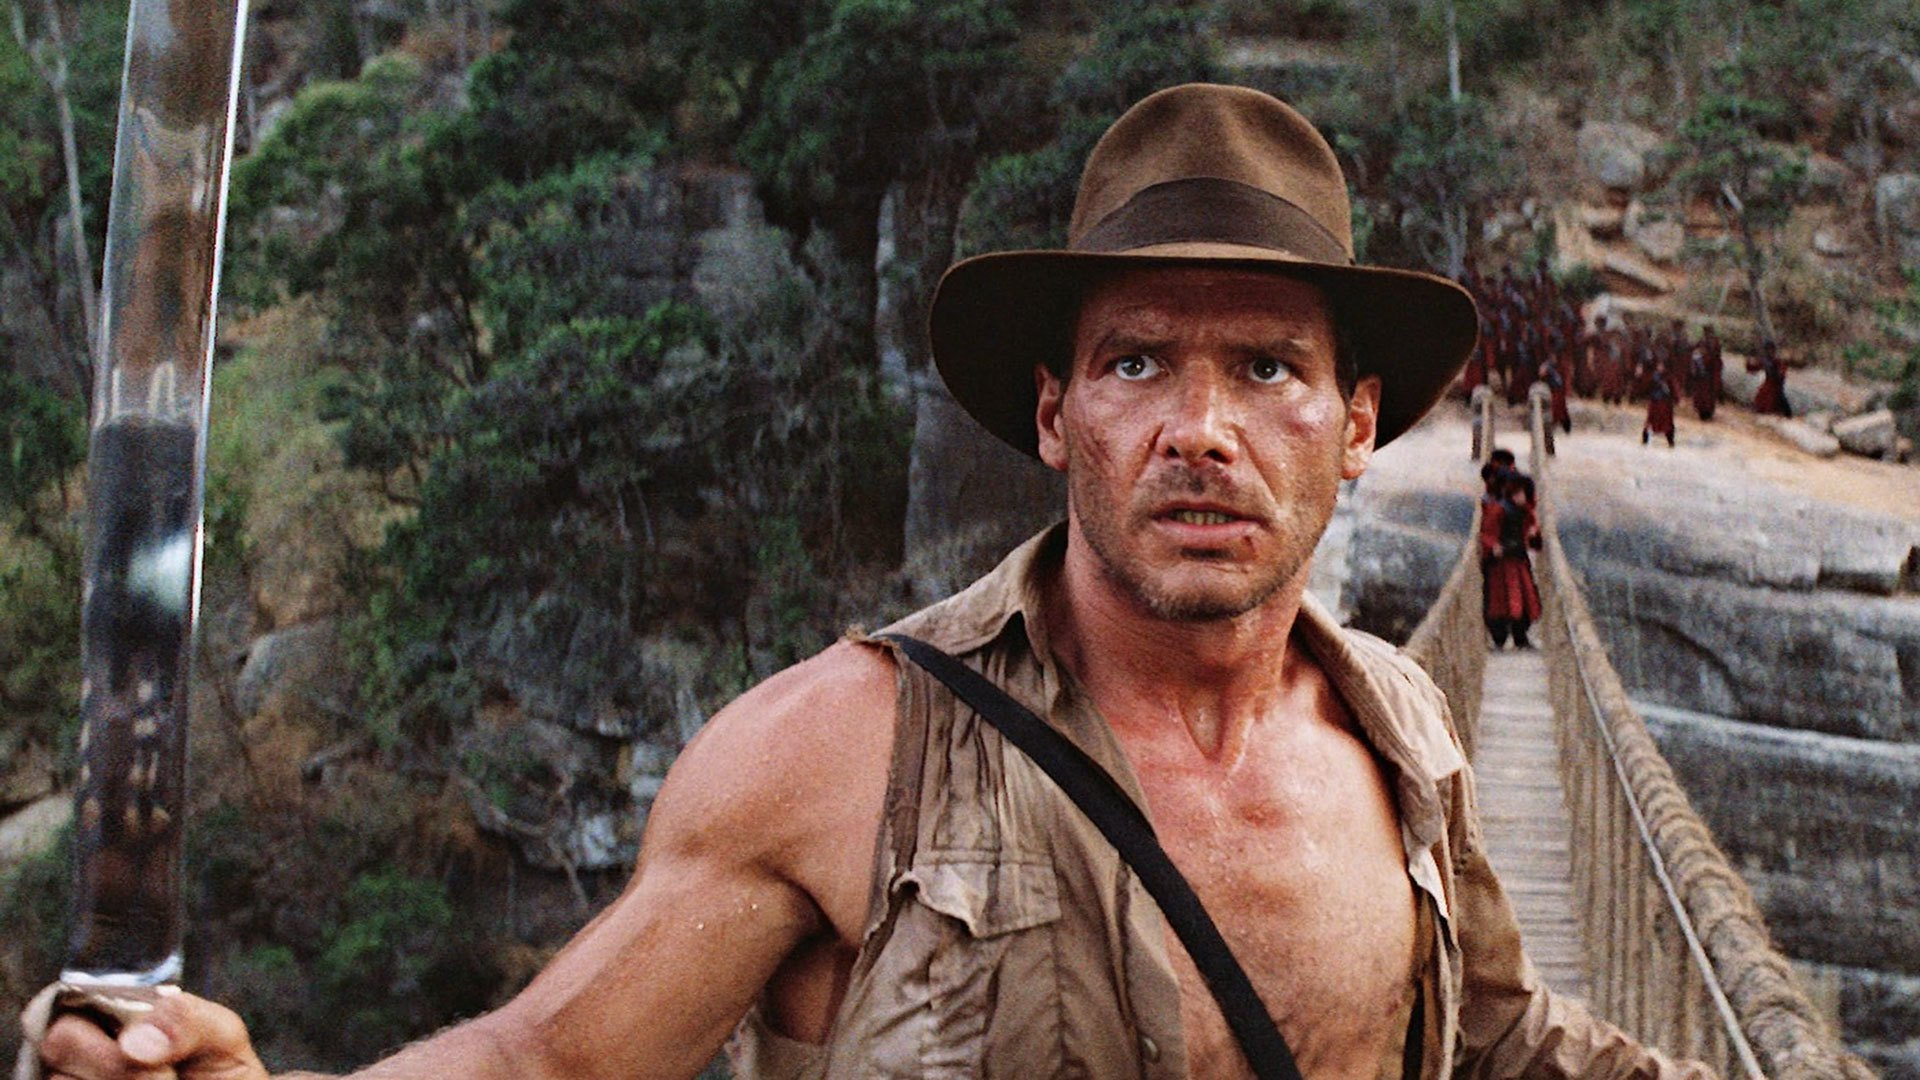 Indiana Jones Harrison Ford {color} Dollar Bill REAL Money!